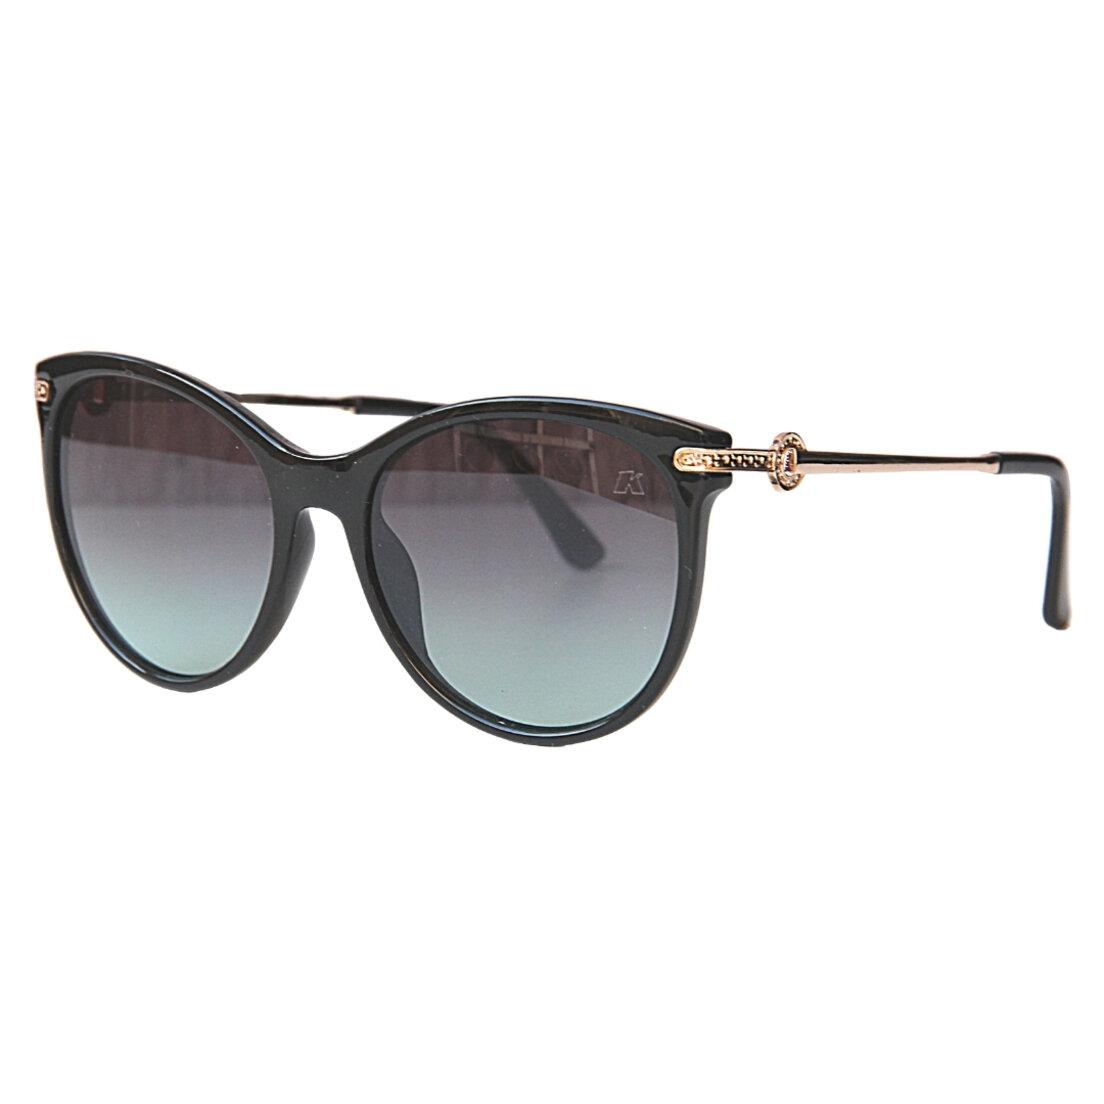 OUTLET - Óculos de Sol Khatto Round - Verde